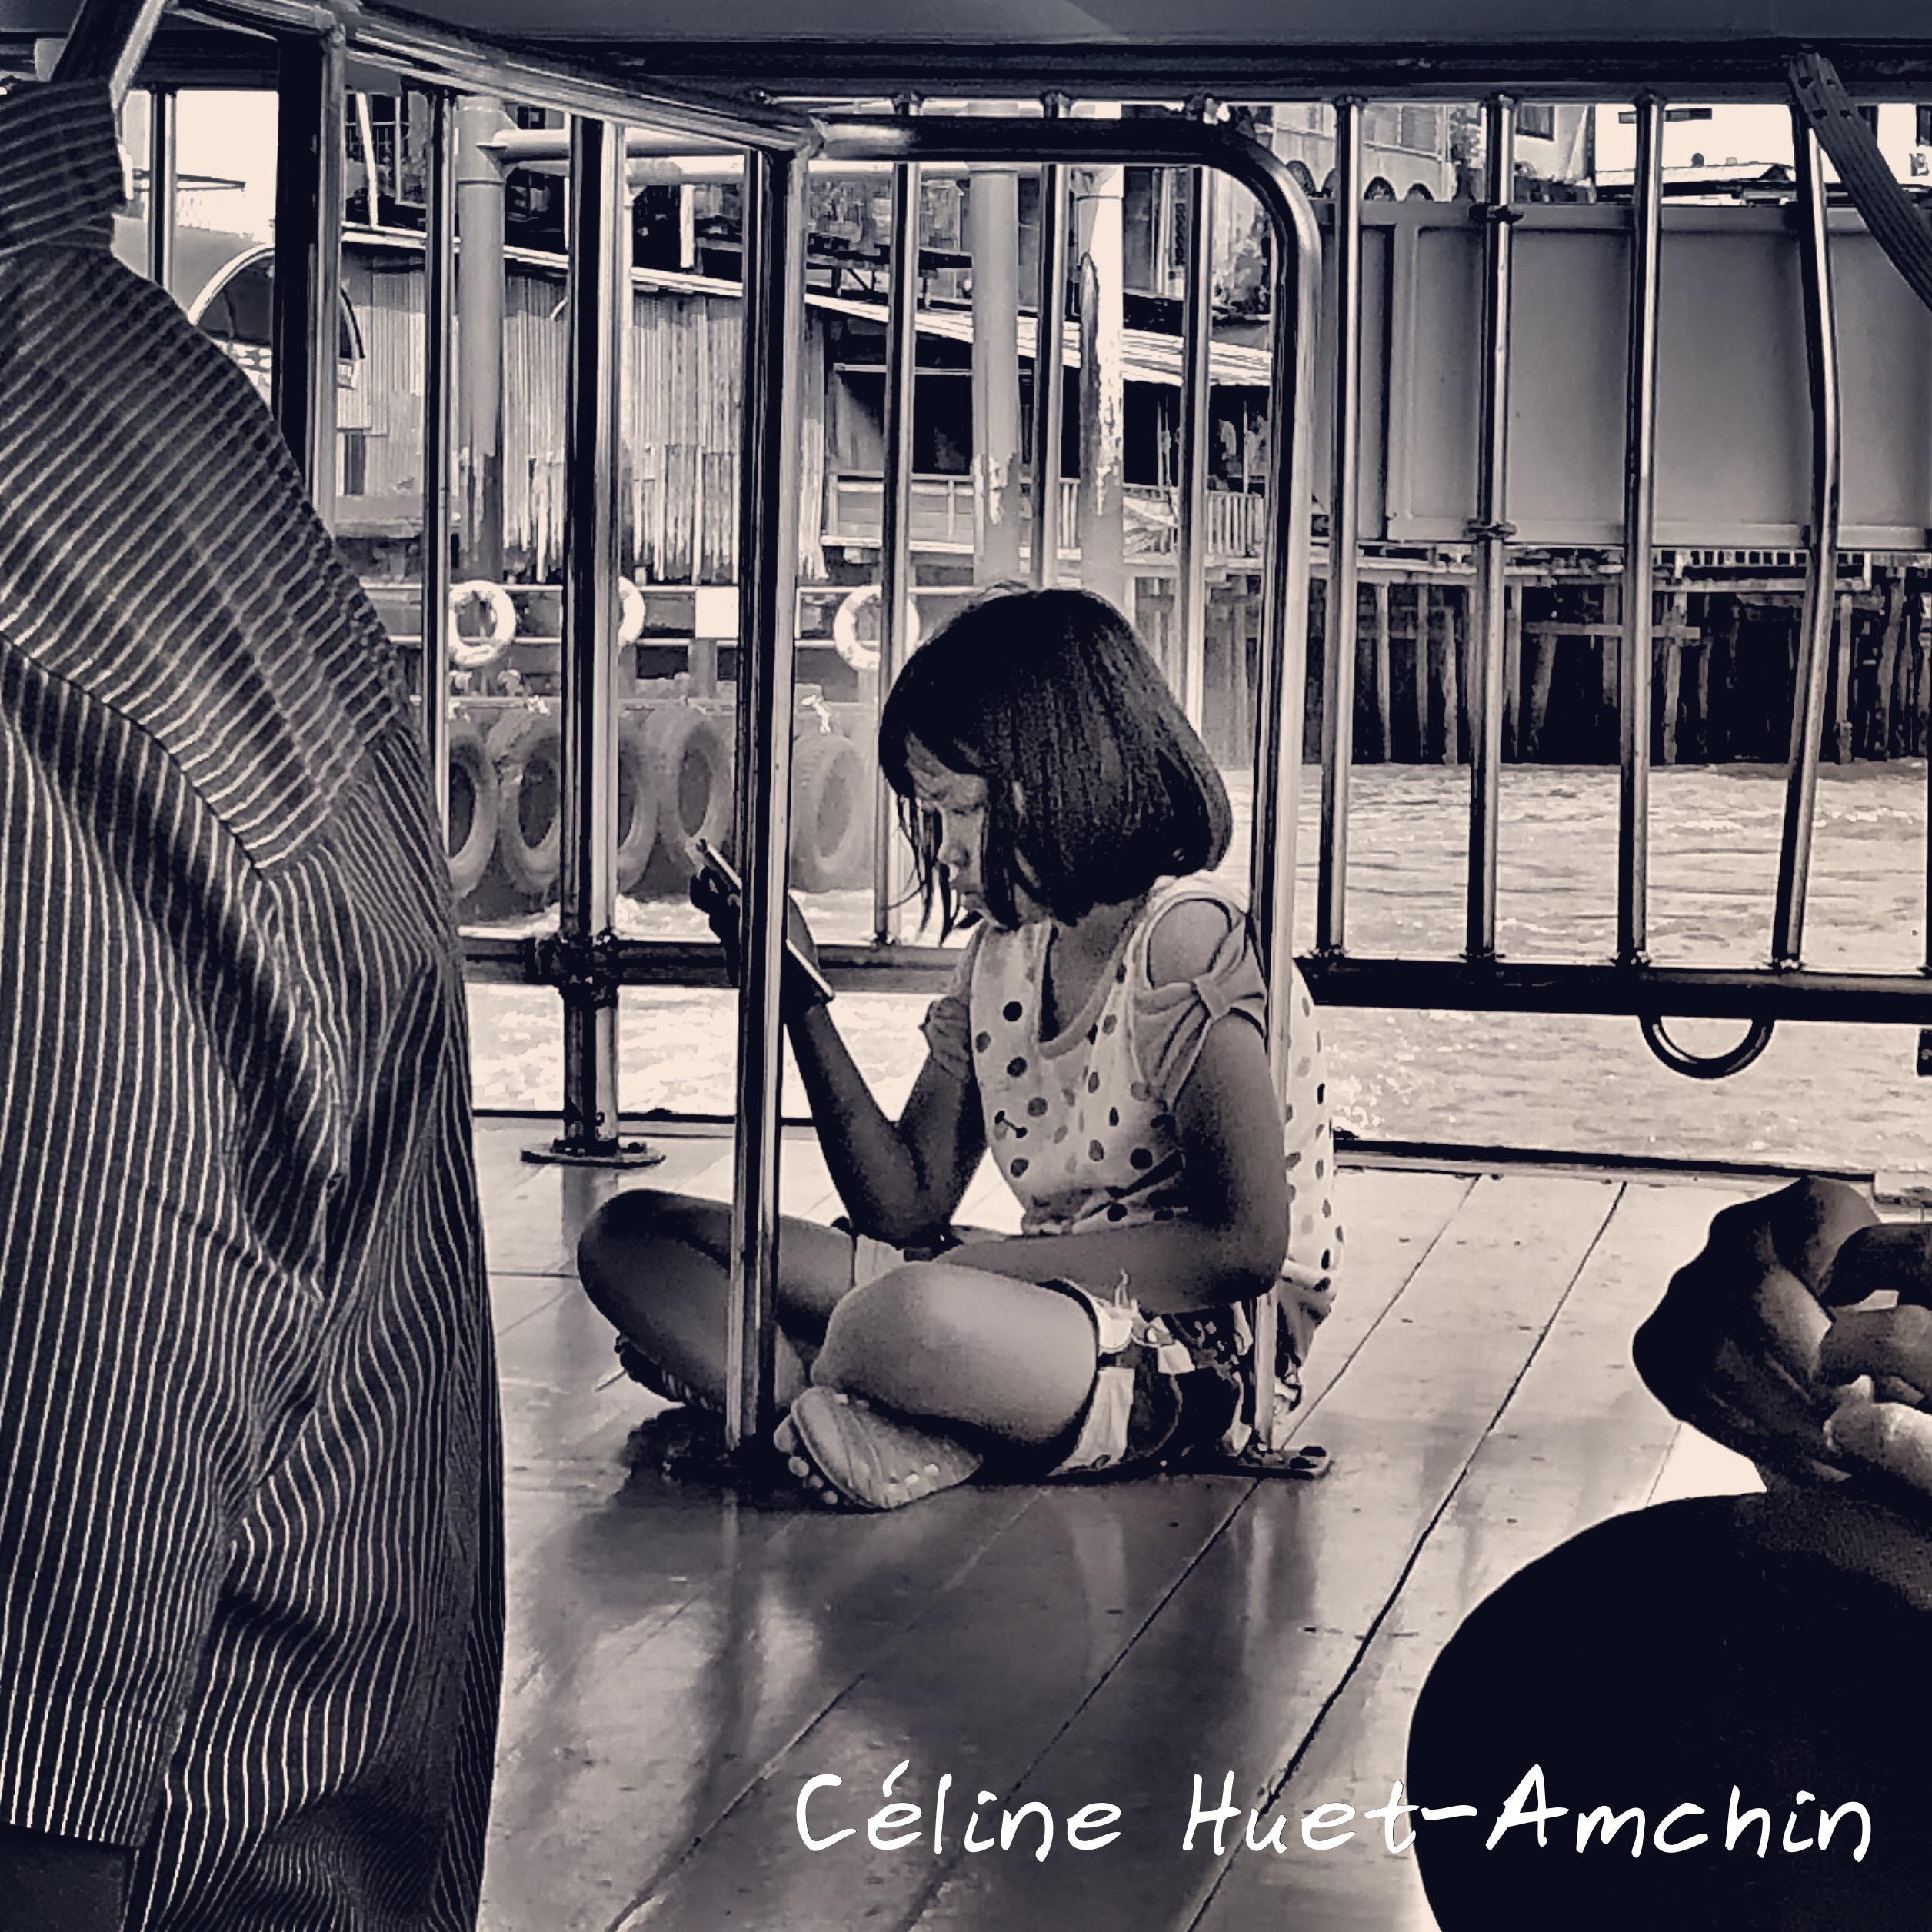 Sur le Chao Praya Bangkok Thaïlande Asie